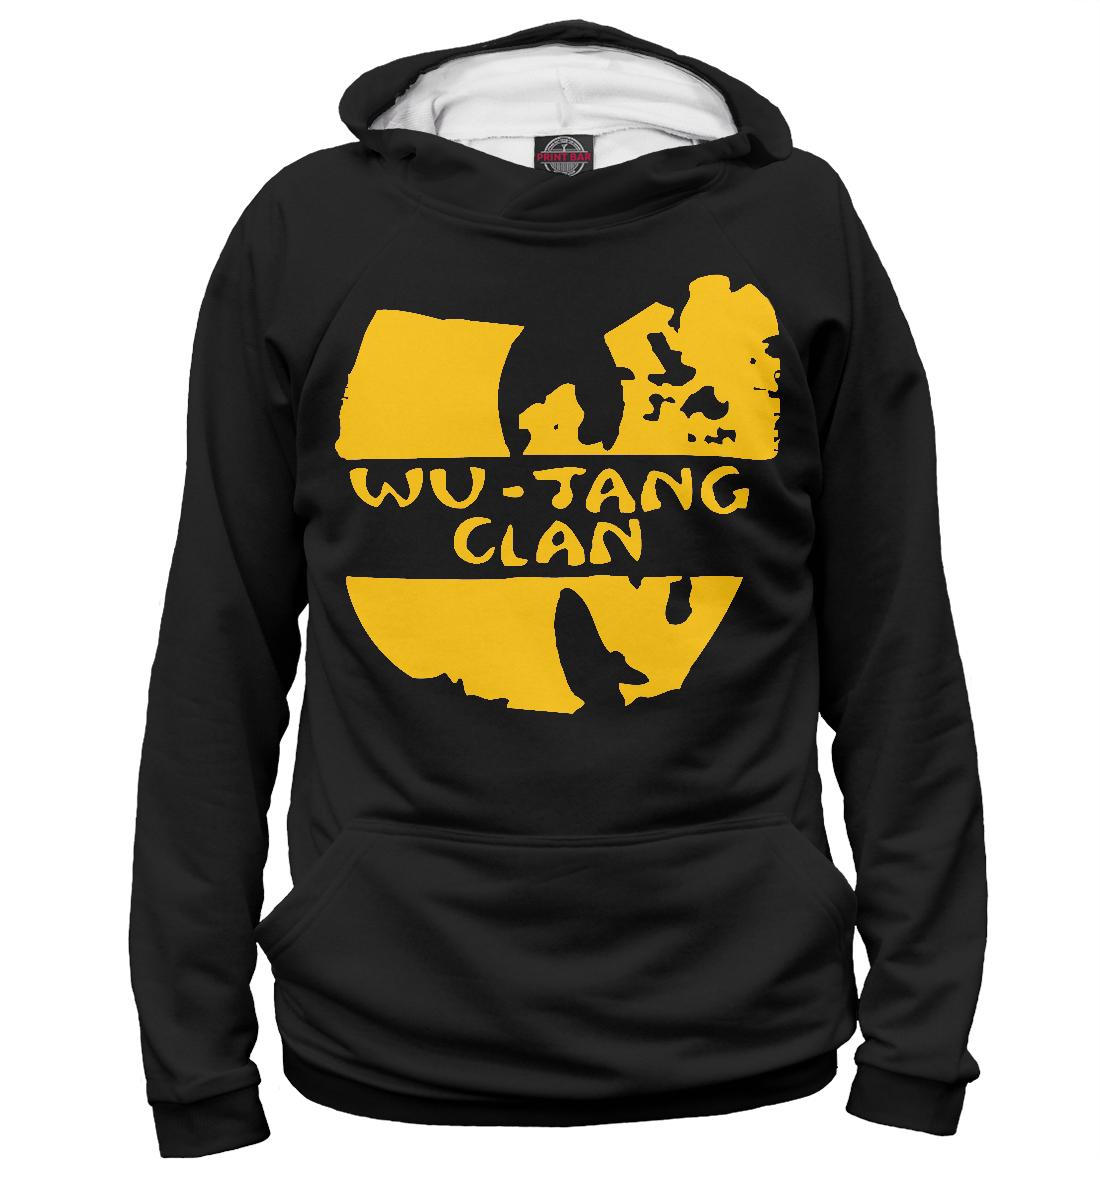 Купить Wu-Tang Clan, Printbar, Худи, WTK-671520-hud-2